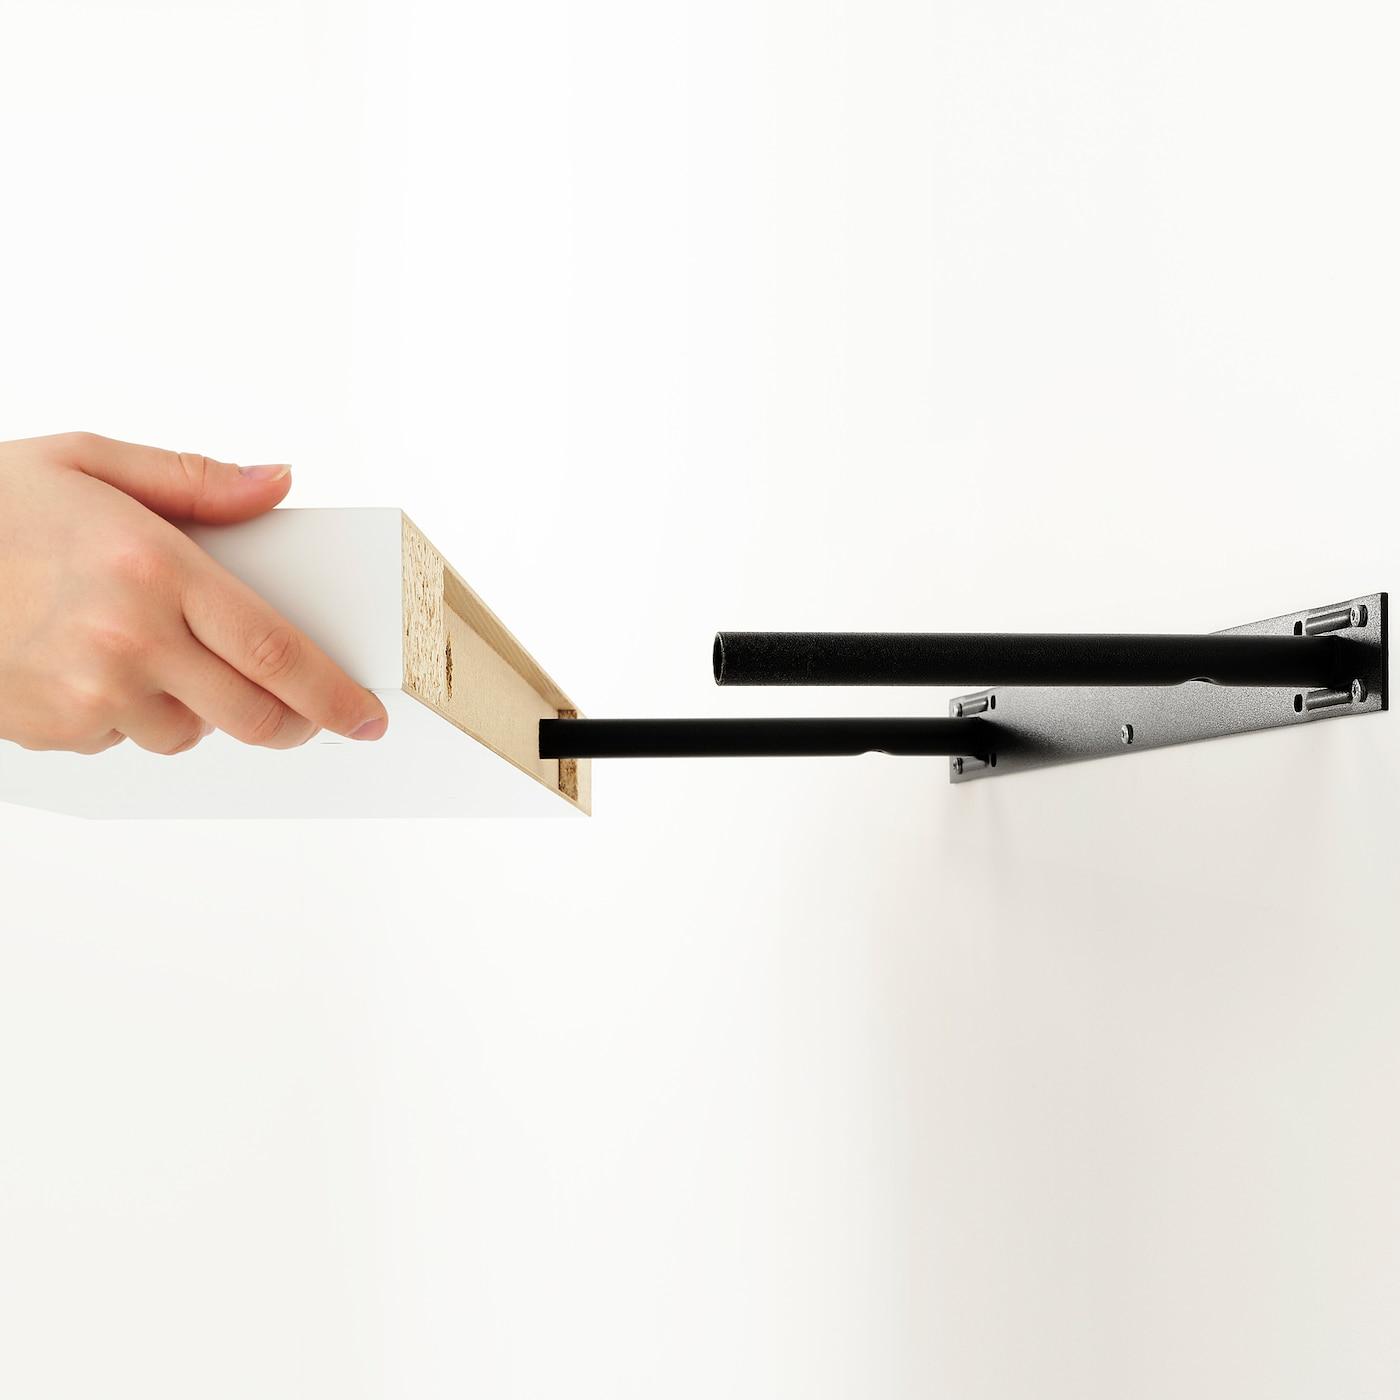 Lack Wandplank Wit 110x26 Cm Ikea